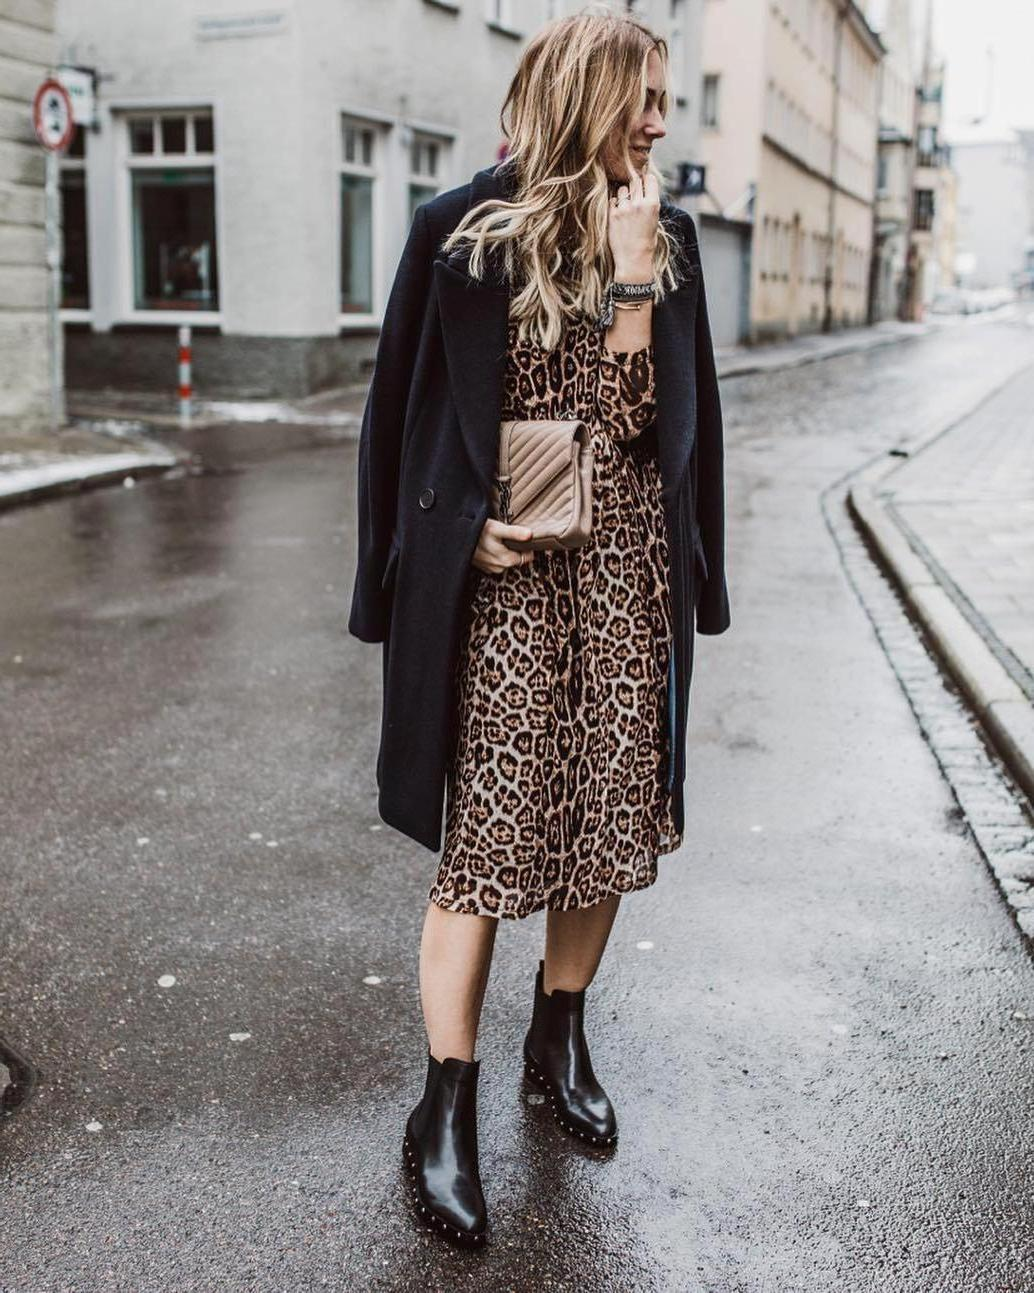 Coat Leopard Coat Midi Dress Ankle Boots Leopard Print Black Boots Black Coat Oversized Coat Bag cover image